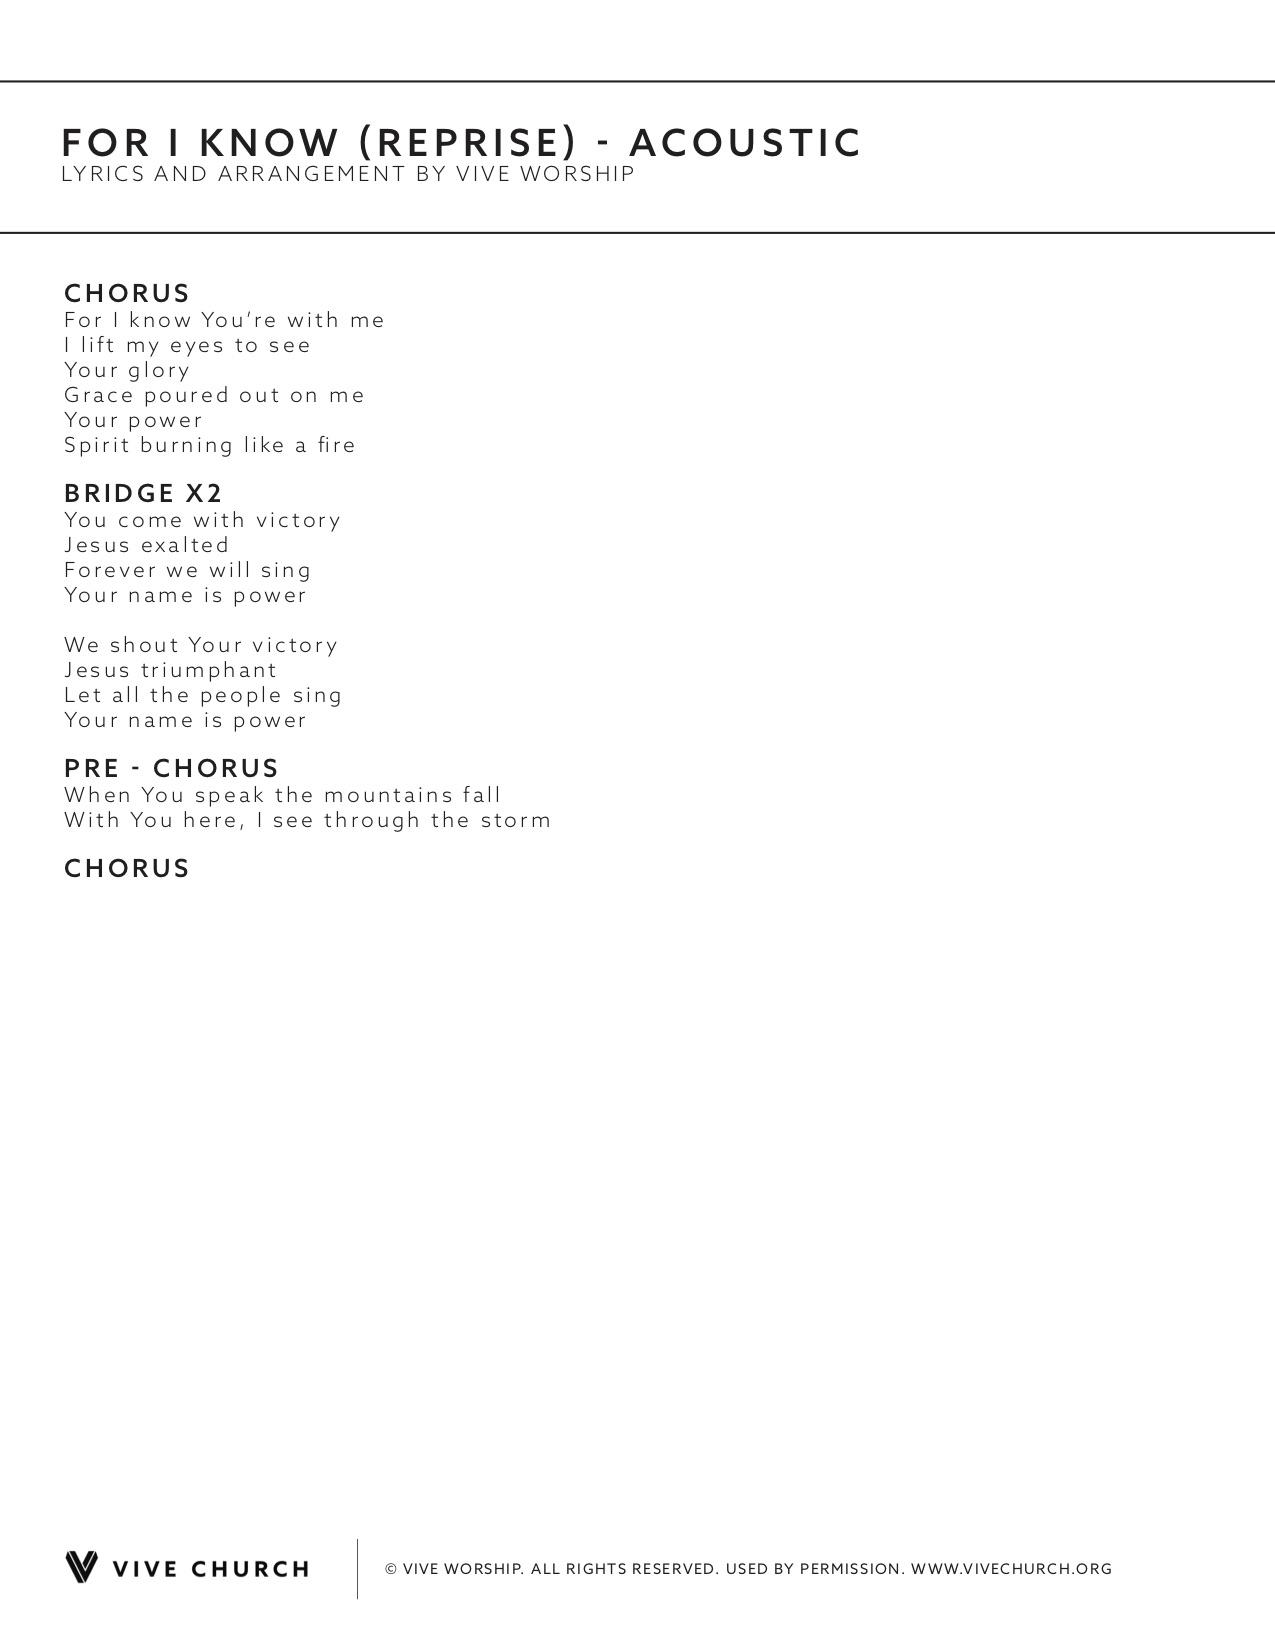 Lyrics_For_I_Know_VIVEWorship.jpg